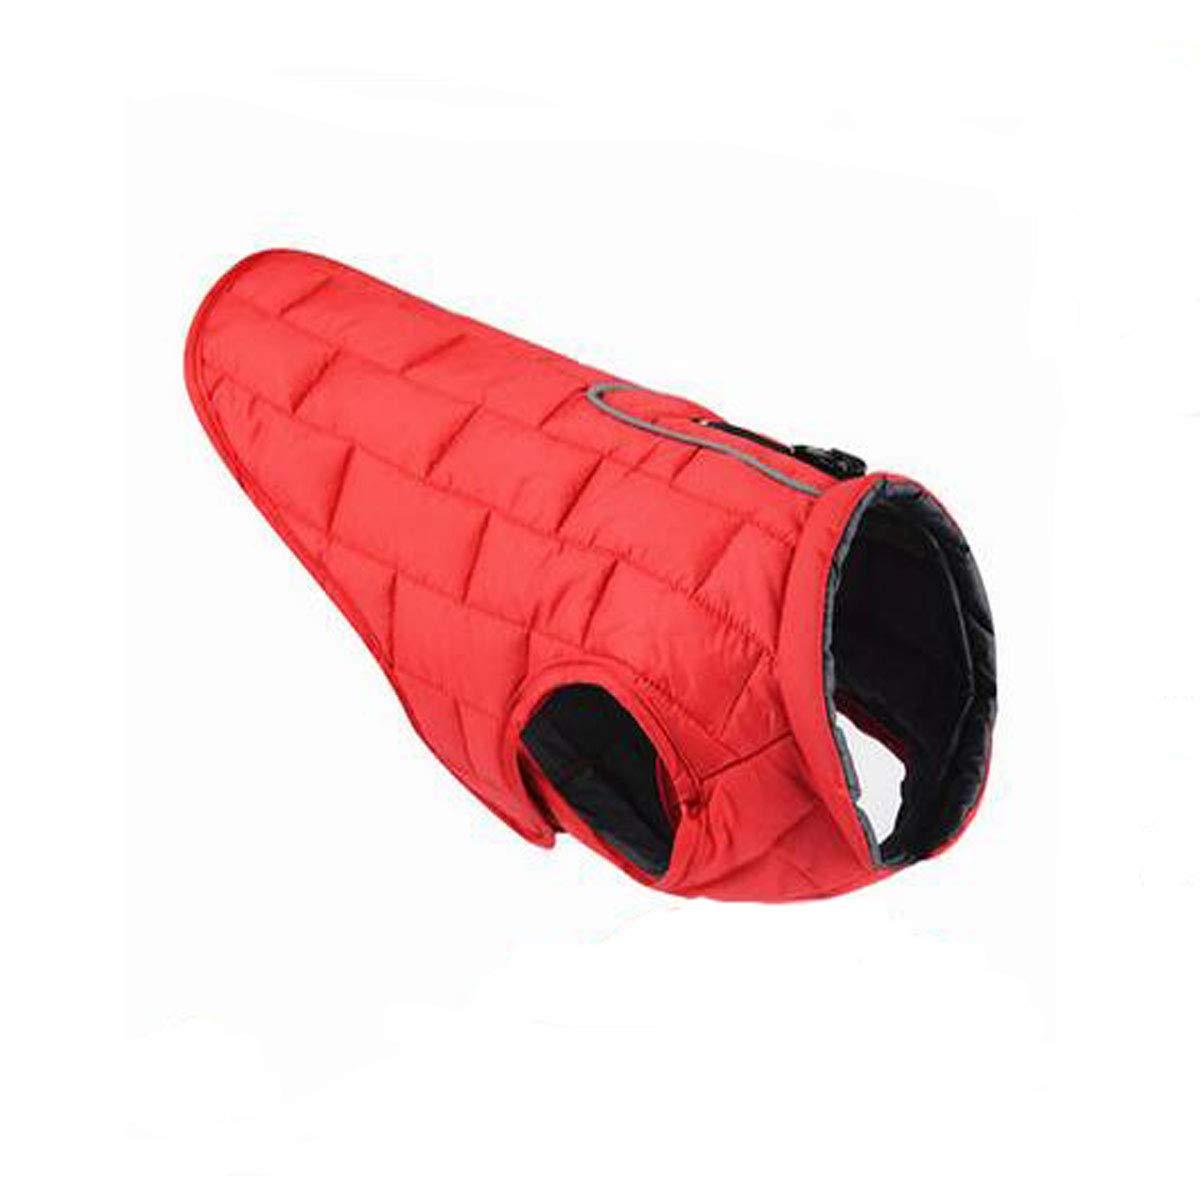 Red L Red L Pet Waterproof Clothing, Medium Dog, Big Dog Cotton Vest (color   Red, Size   L)